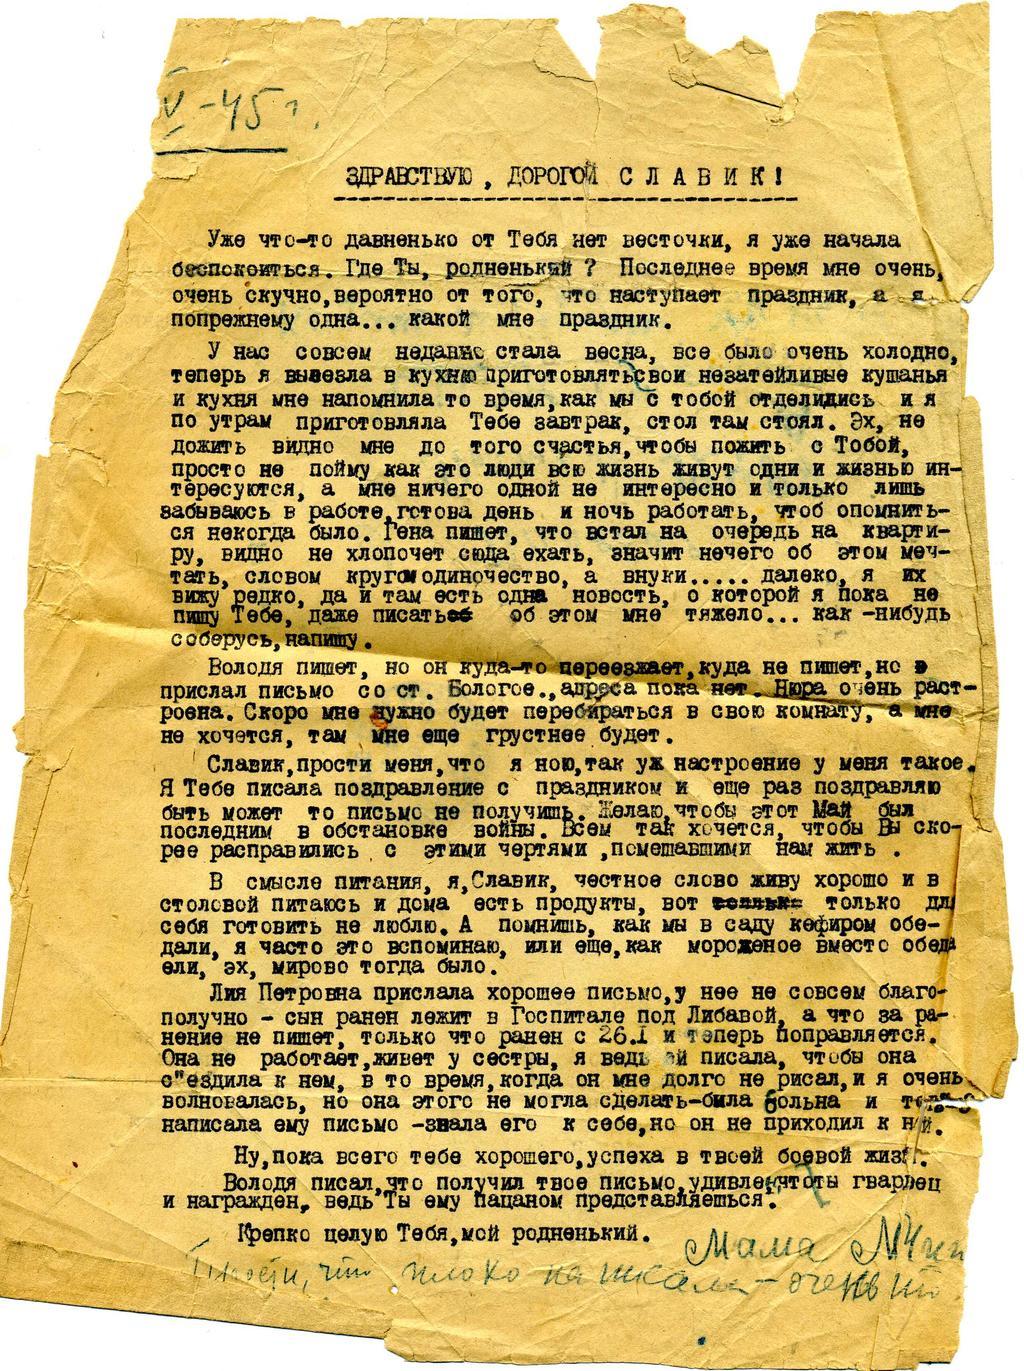 Письмо Чиж М.Н. сыну.1945 (напечатано на машинке) ©Tatfrontu.ru Photo Archive